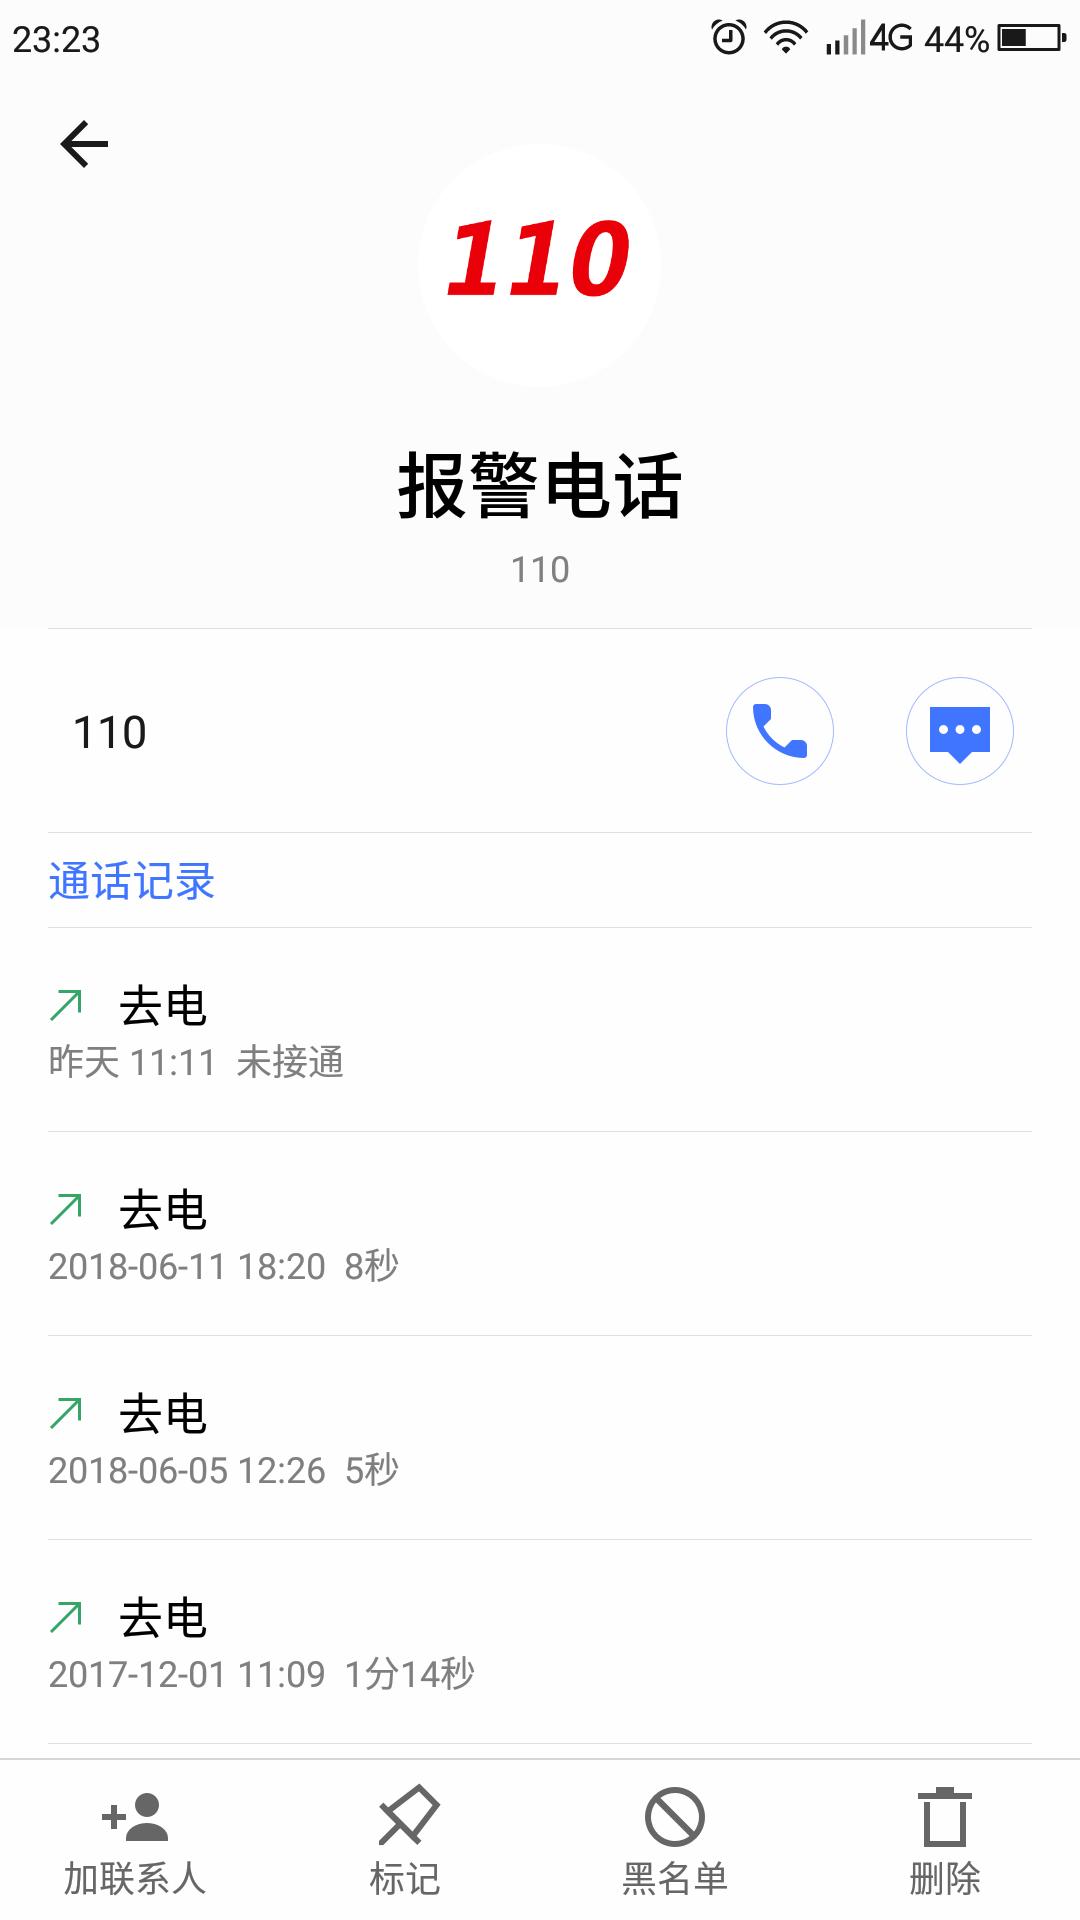 Screenshot_2018-06-16-23-23-23.png